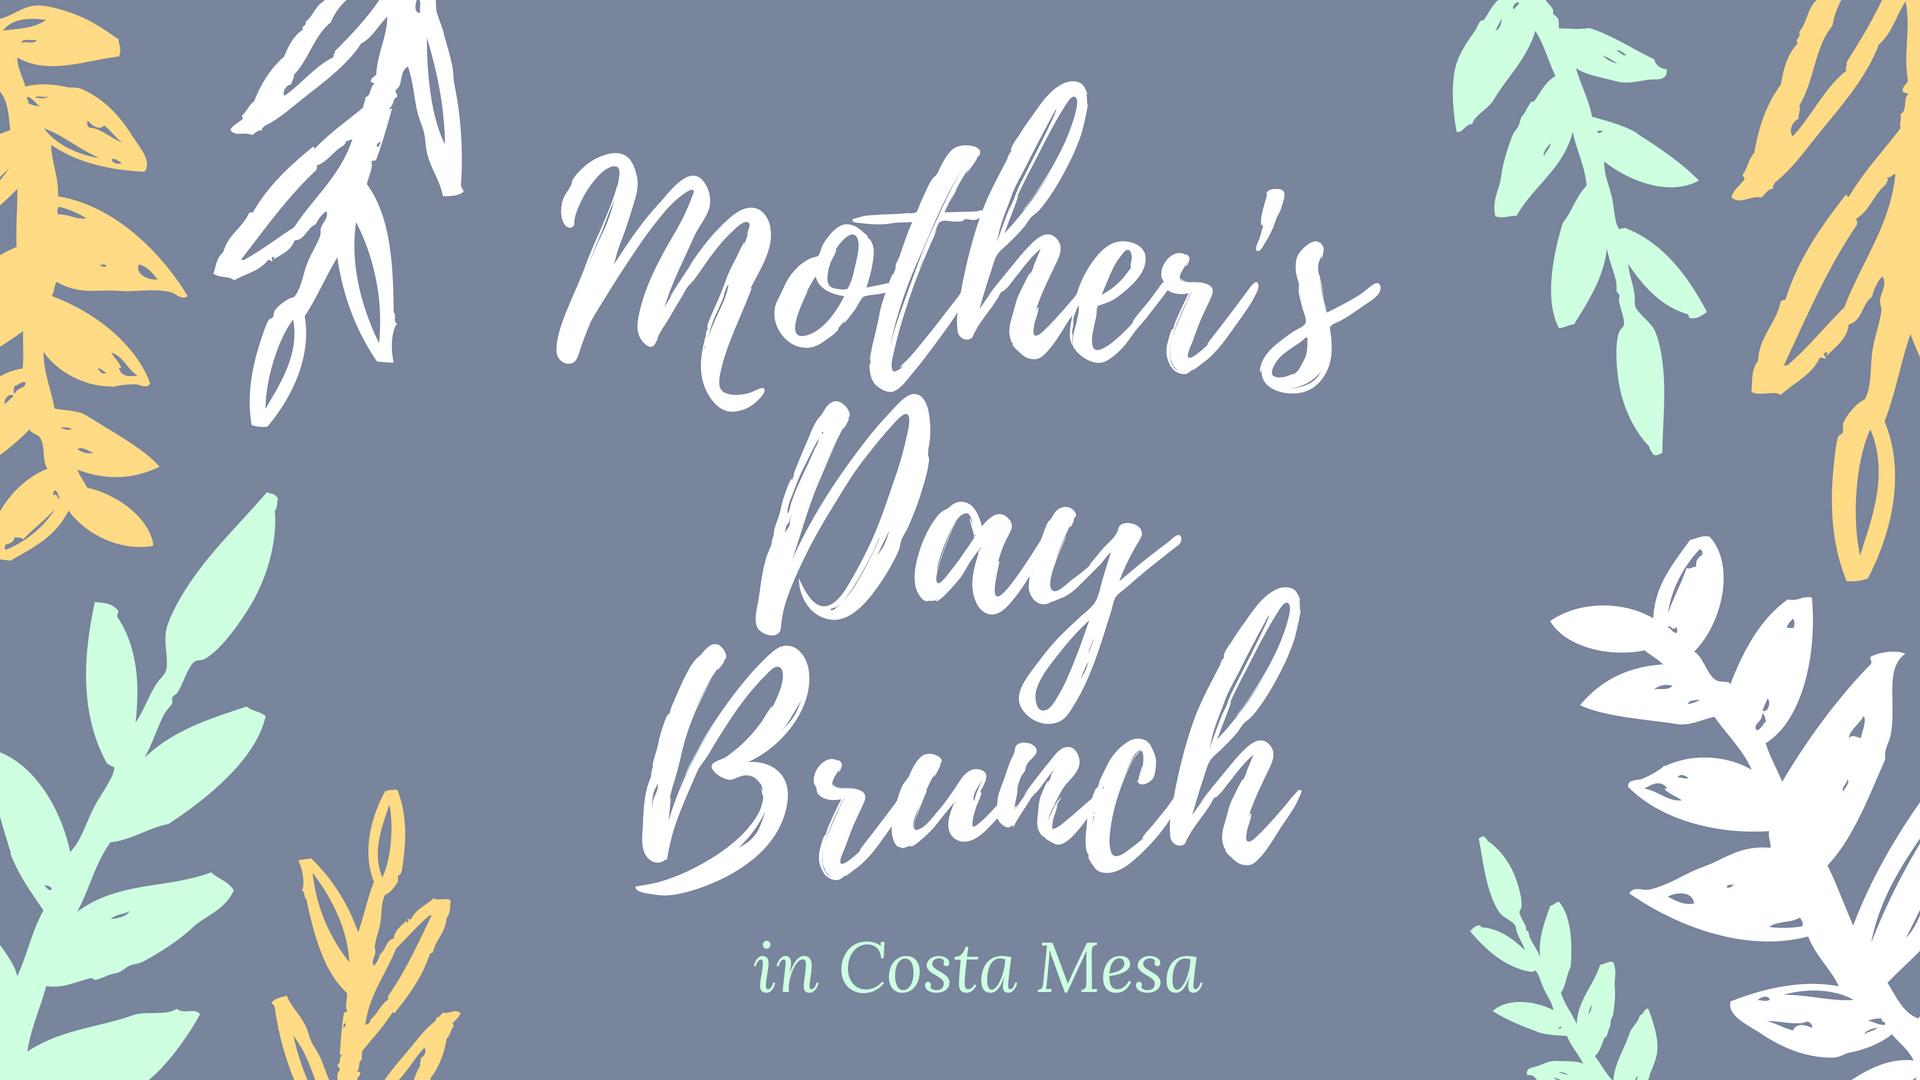 Travel Costa Mesa -